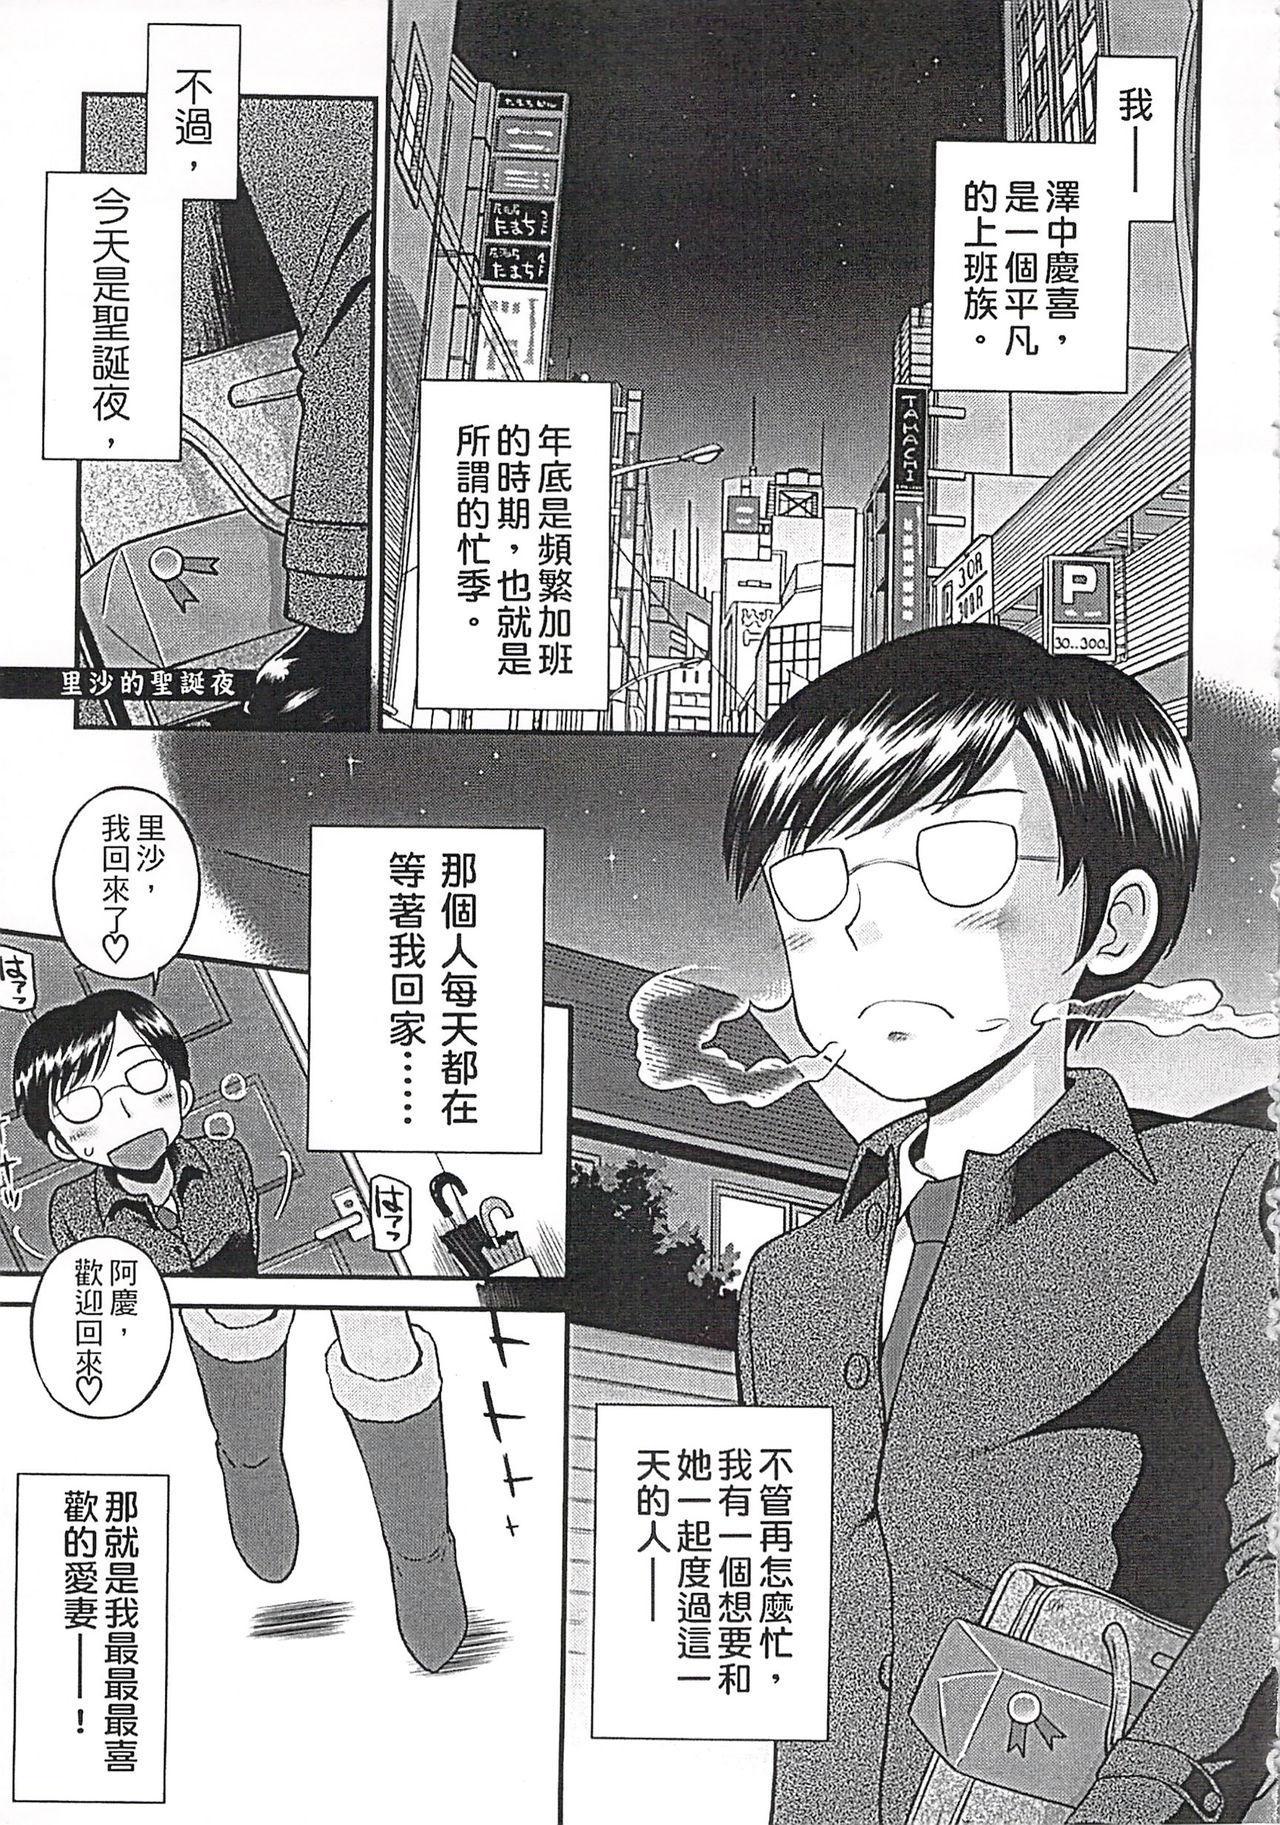 Kore demo Otona Desu Kedo!? Mrs.LOLITA Kanzenban   人家是大人啦! ~Mrs.LOLITA完全版 188